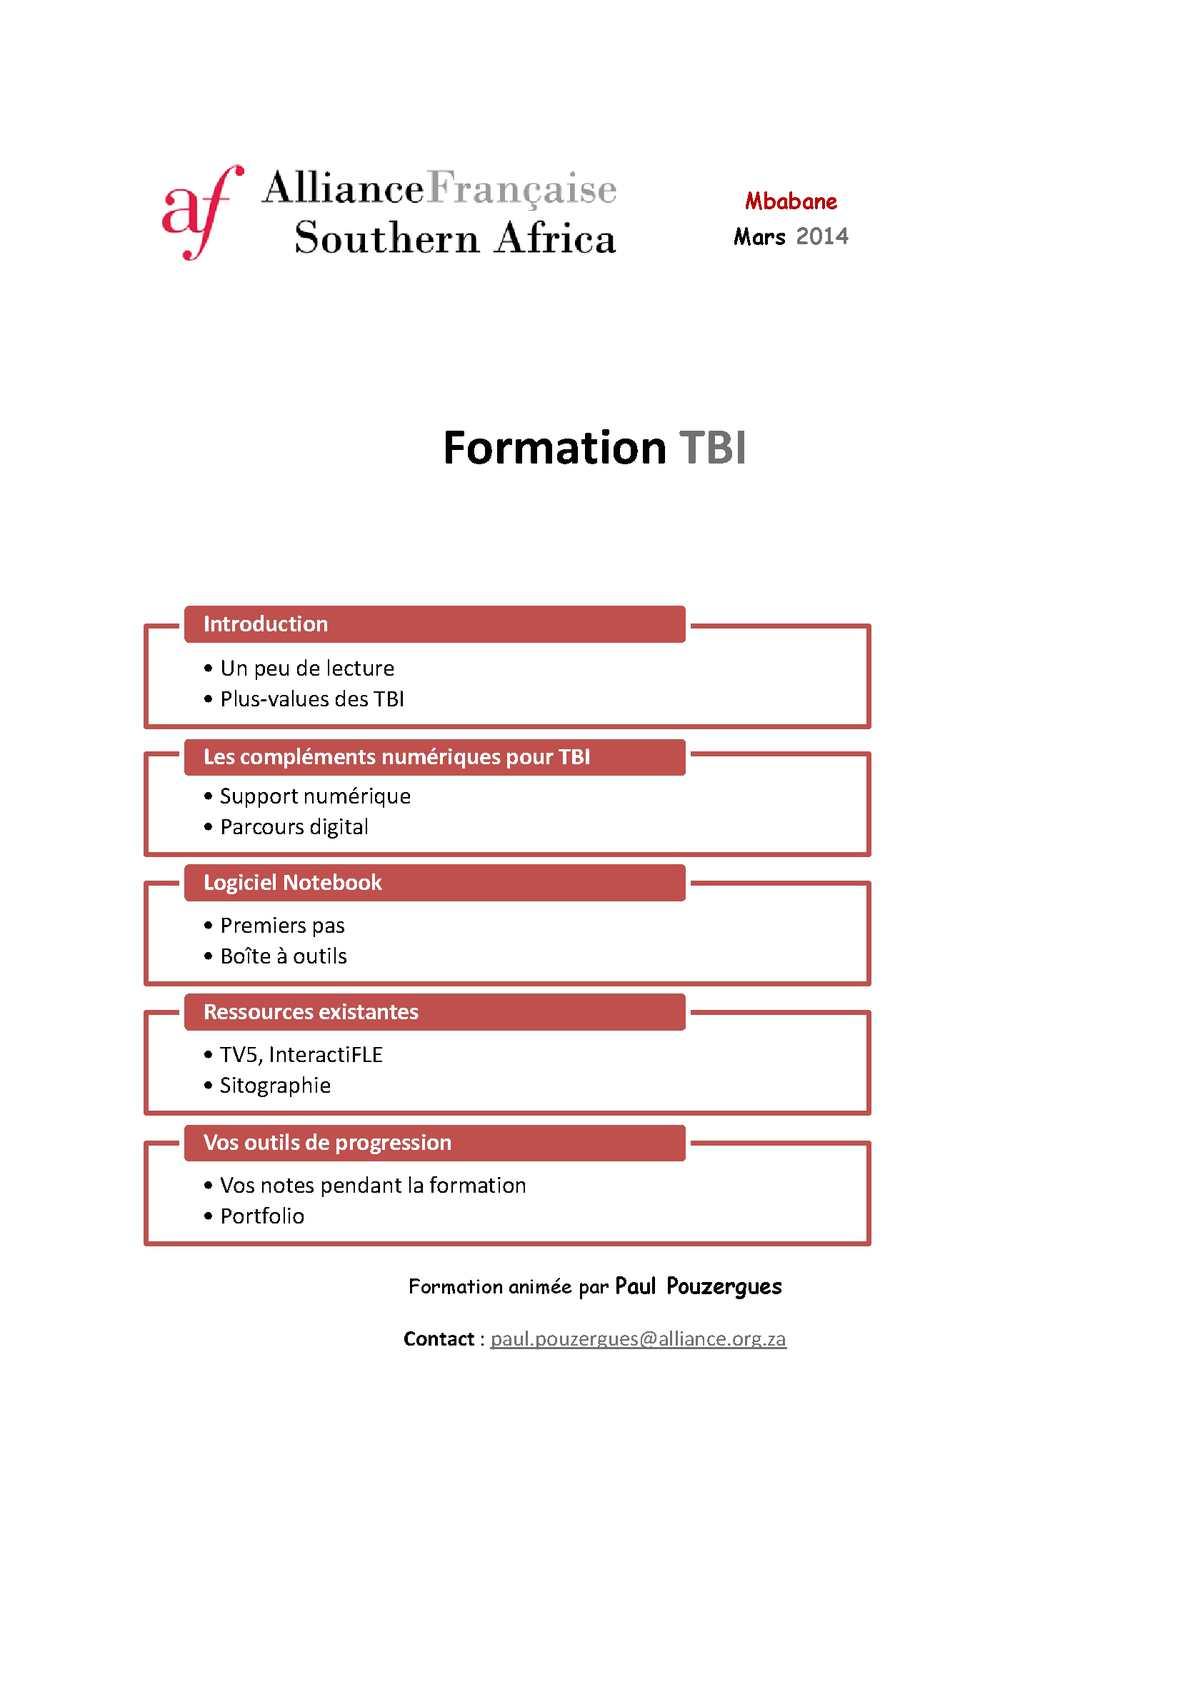 Formation TBI 2014